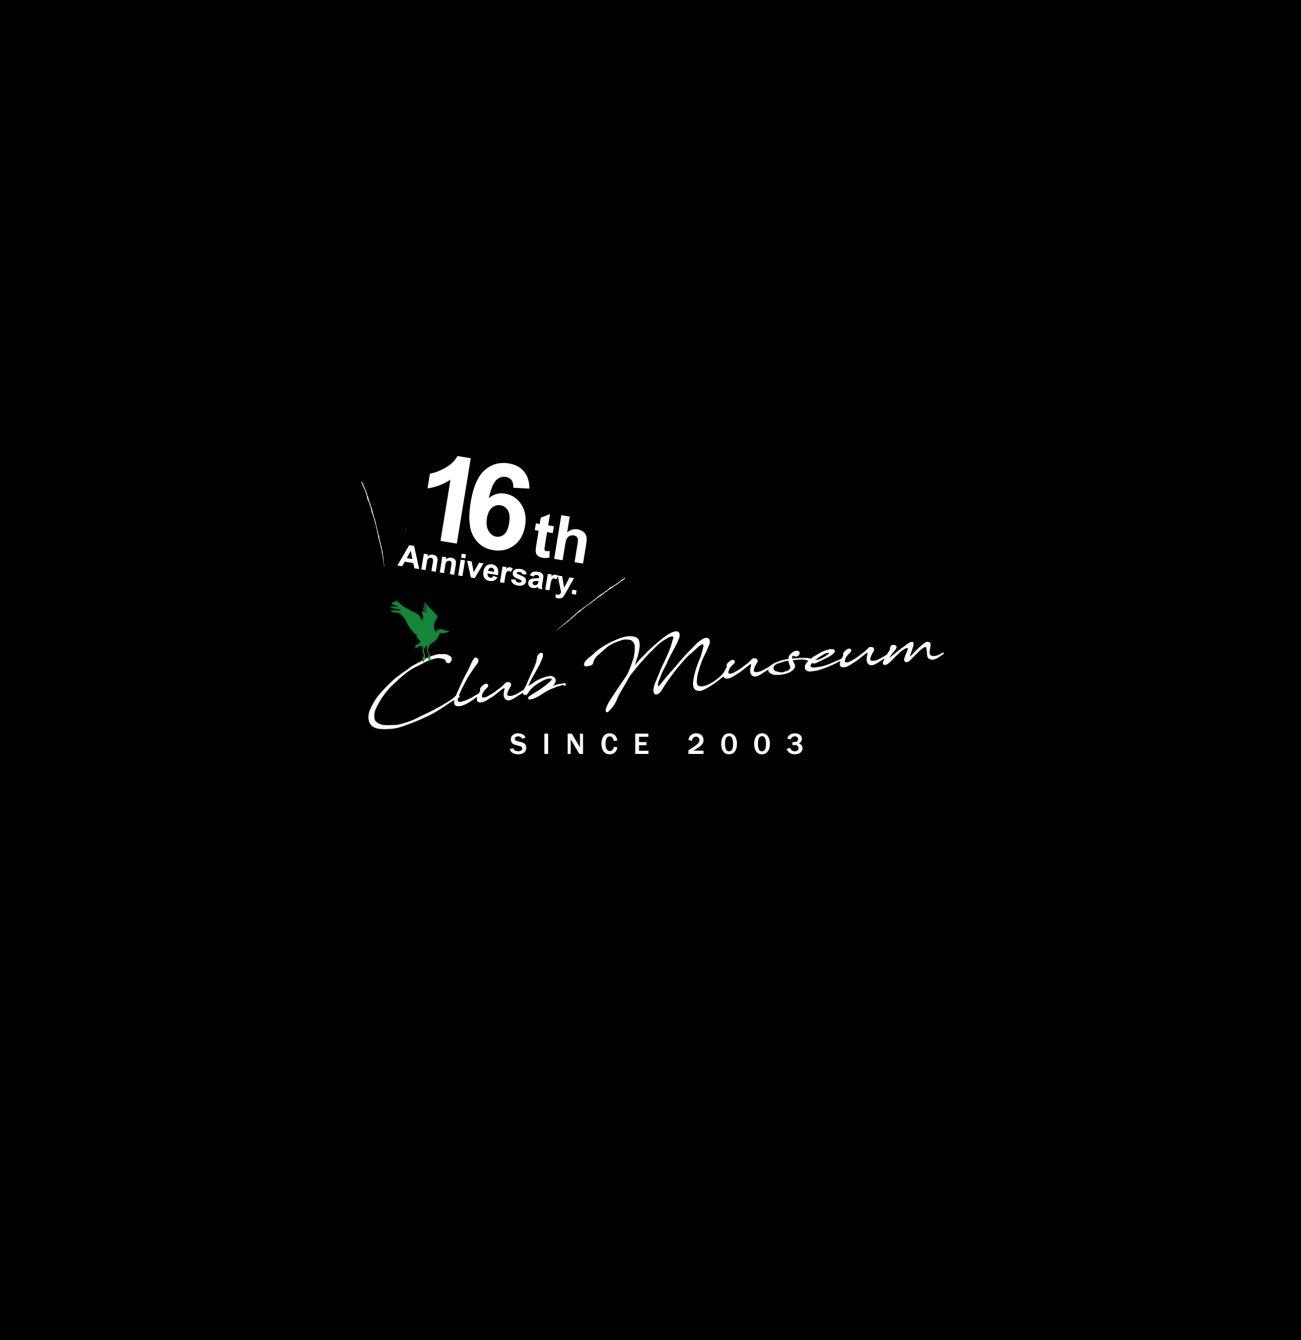 Club Museum 16th Anniv. / Ken Ishii / R&S 1983 - 2018 - Flyer front